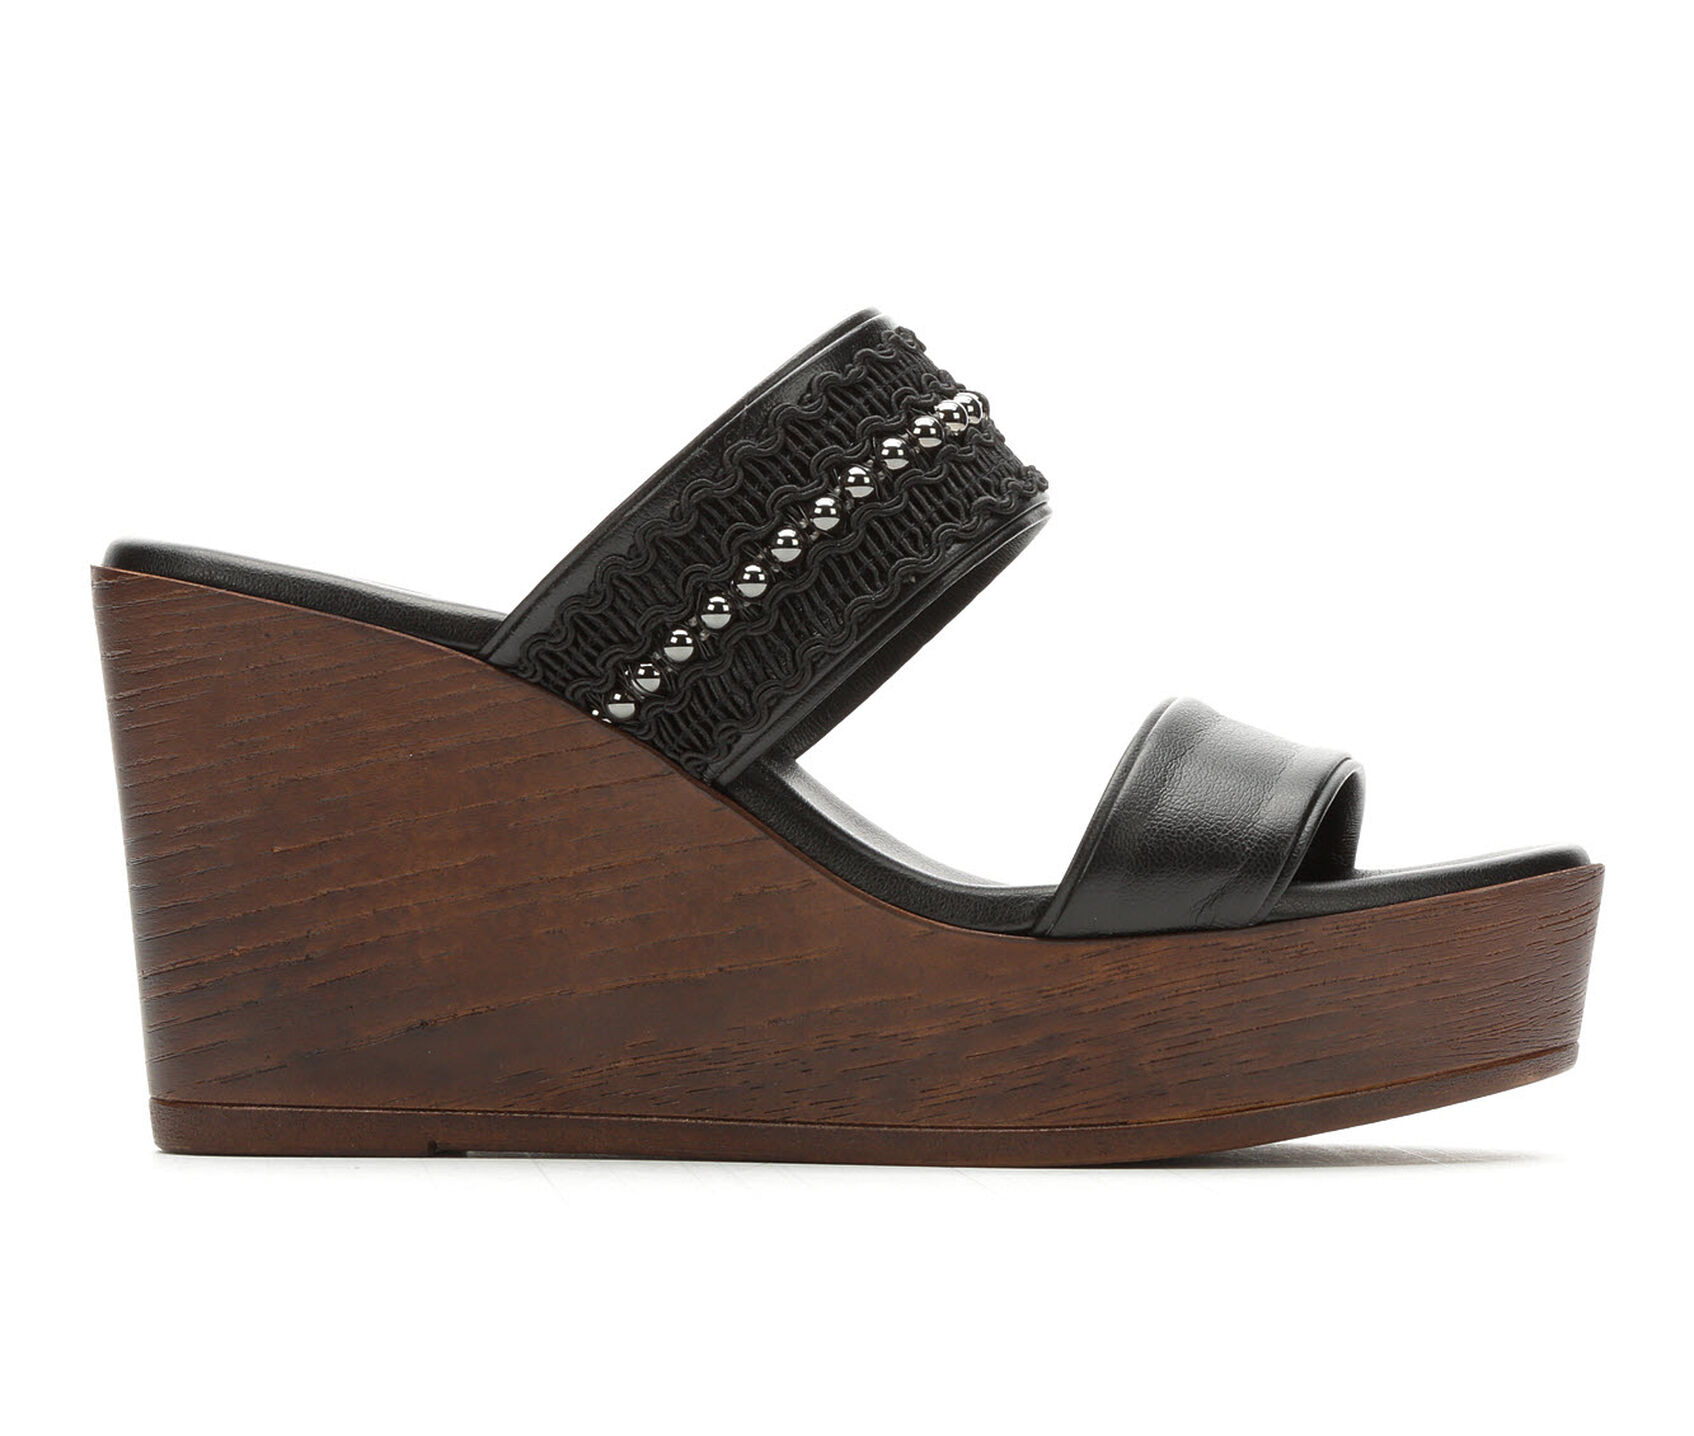 1c9a5fa6ebf8 Women s Italian Shoemakers Audi Wedge Sandals